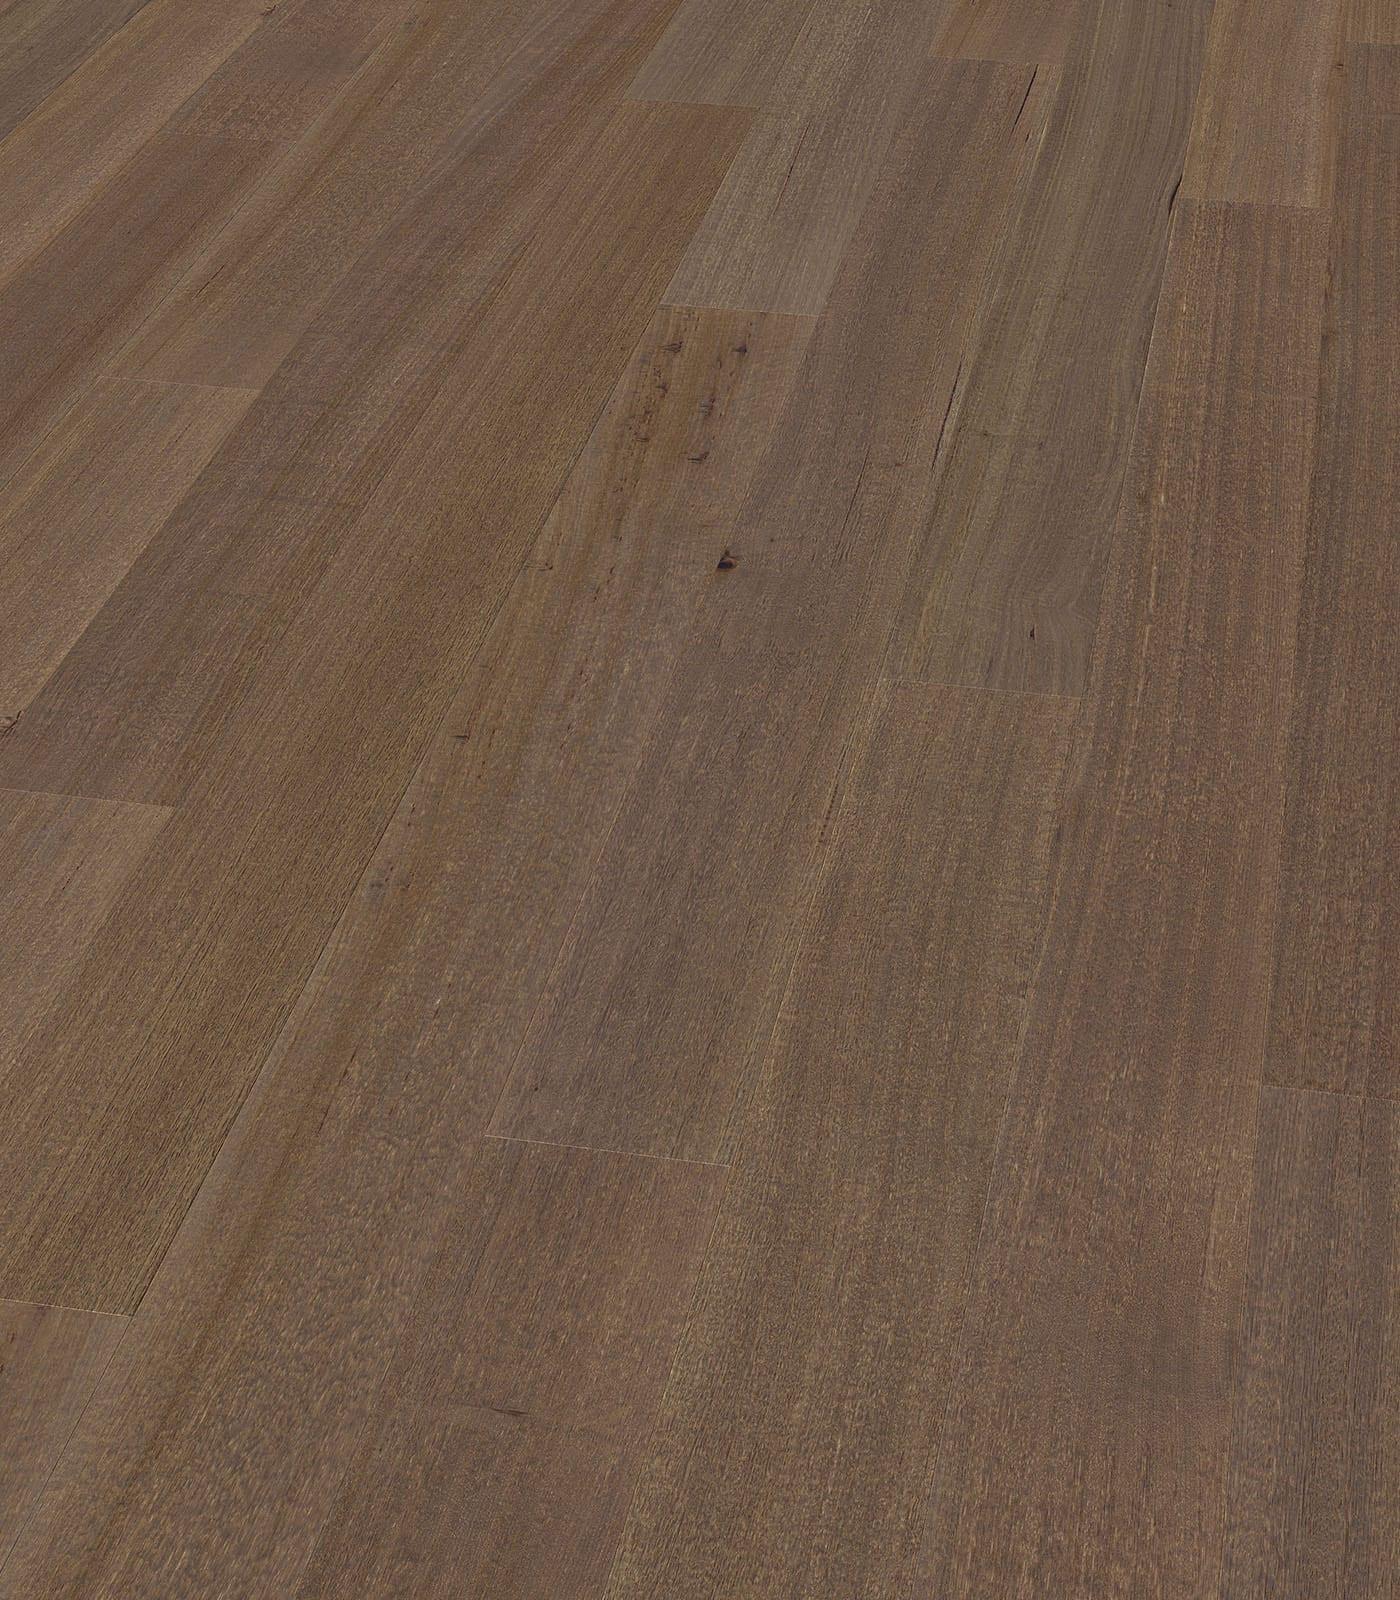 Rockdale-After Oak Collection-Tasmanian Oak floors - angle